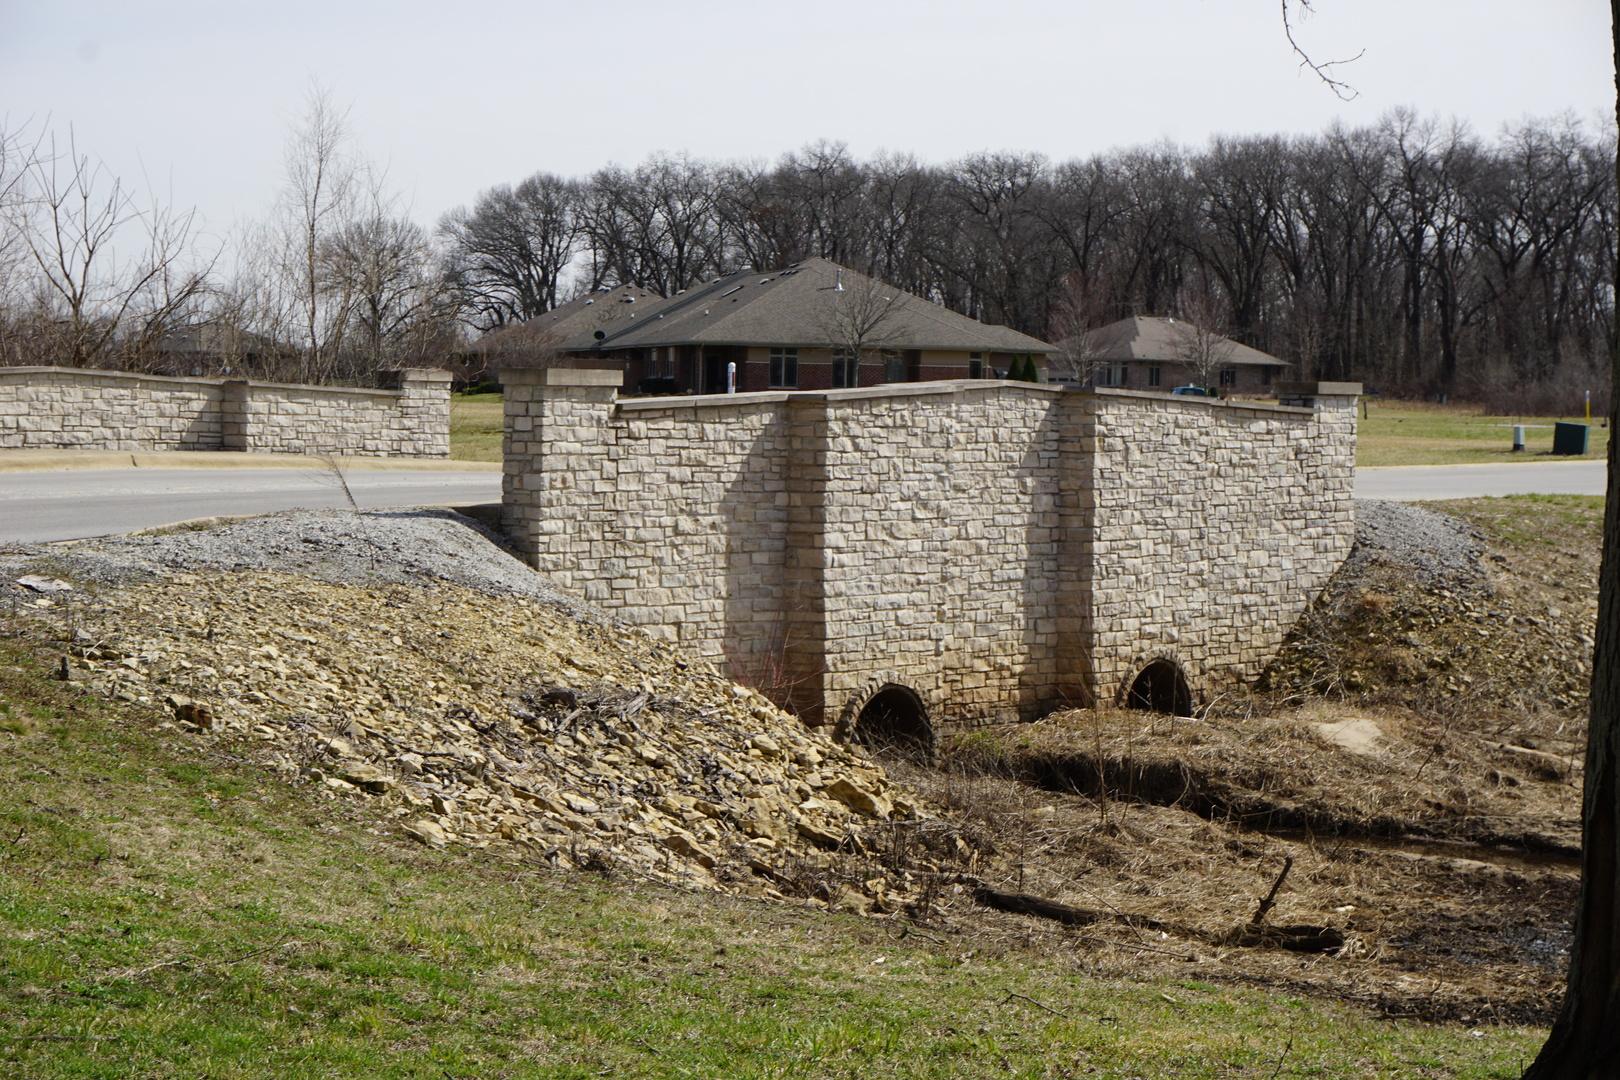 211 River Run Drive, St. Anne, IL, 60964 Photo 1